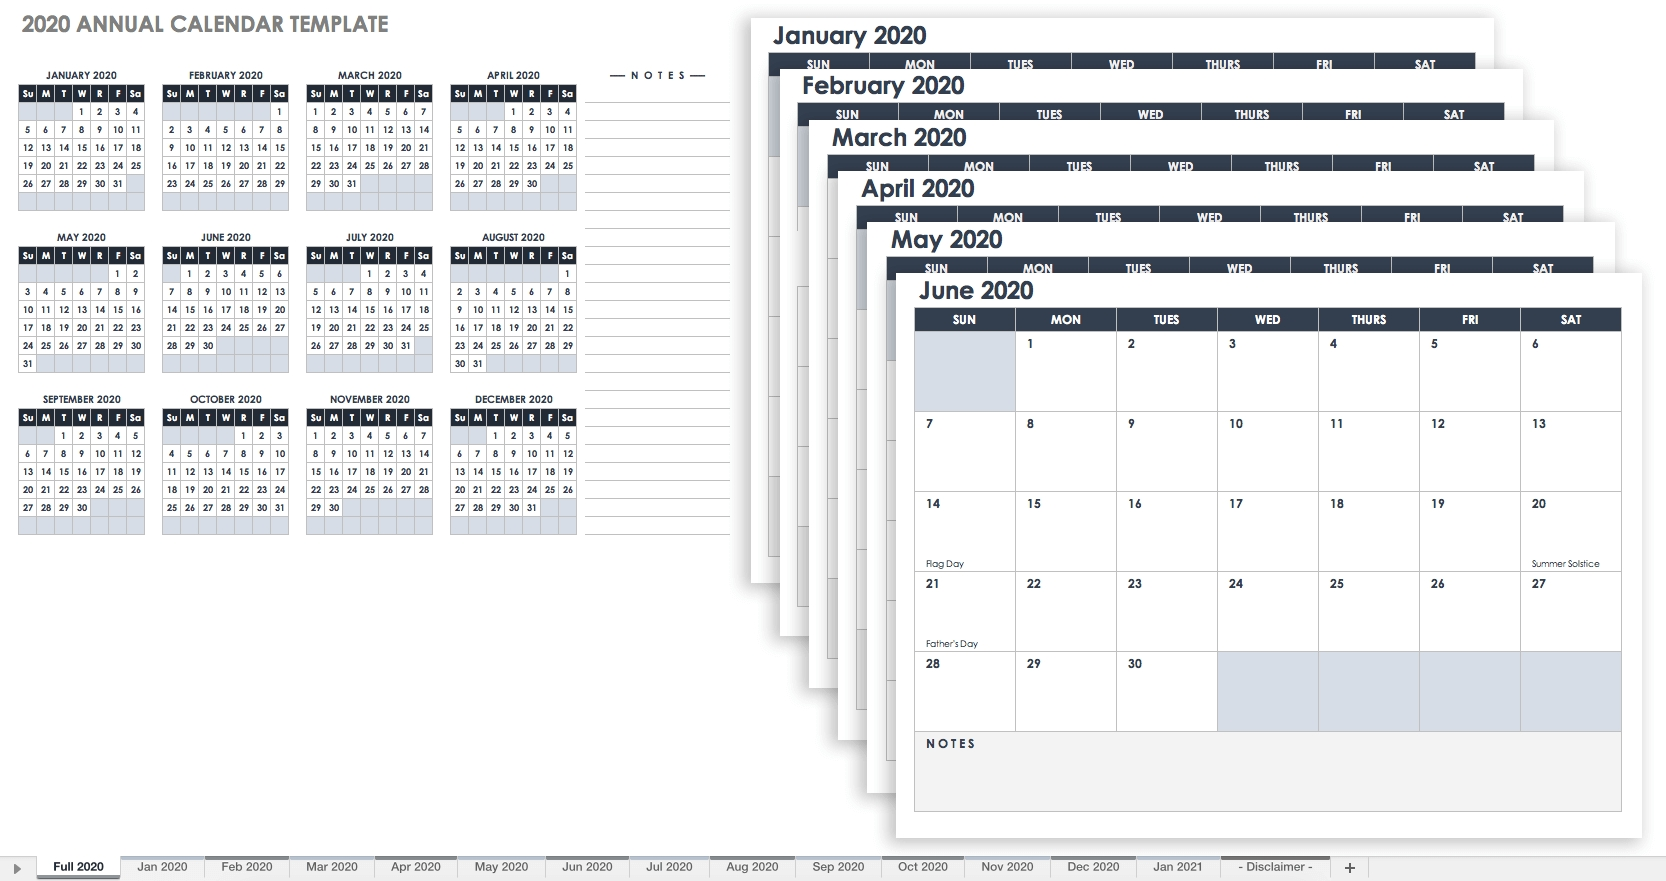 Free Excel Calendar Templates_Blank Calendar 2020 12 Month